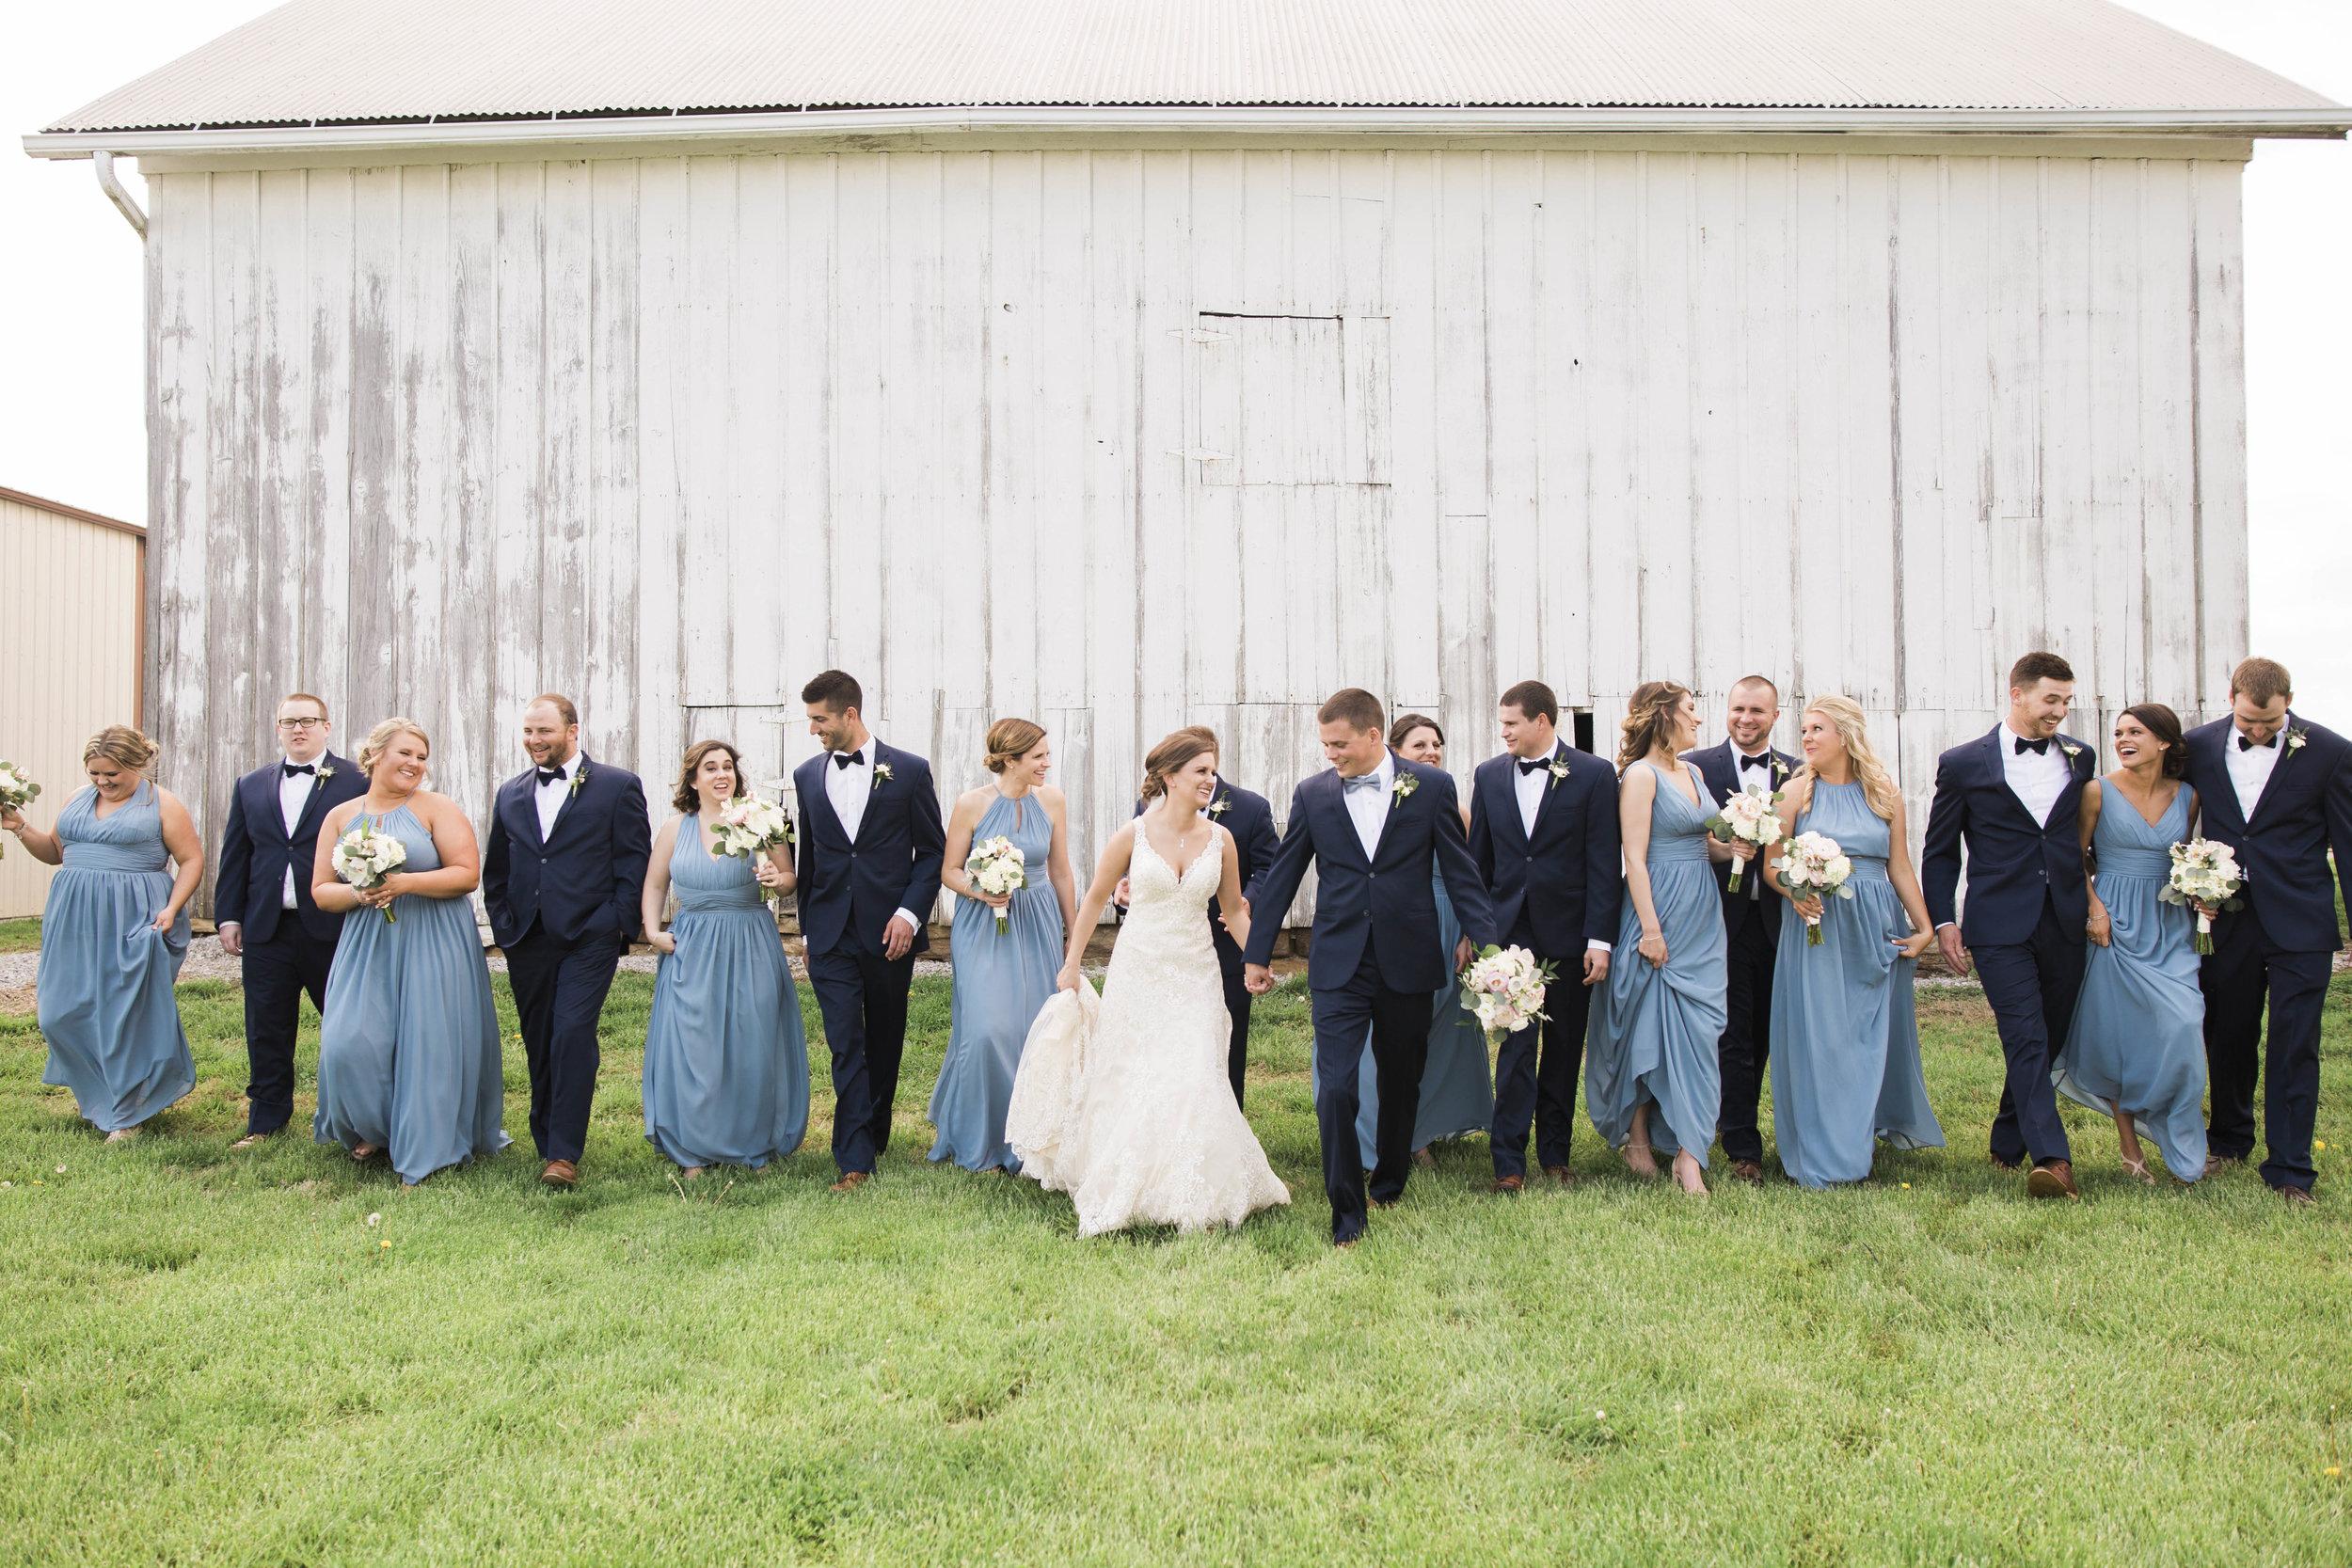 shotbychelsea_wedding_blog-24.jpg